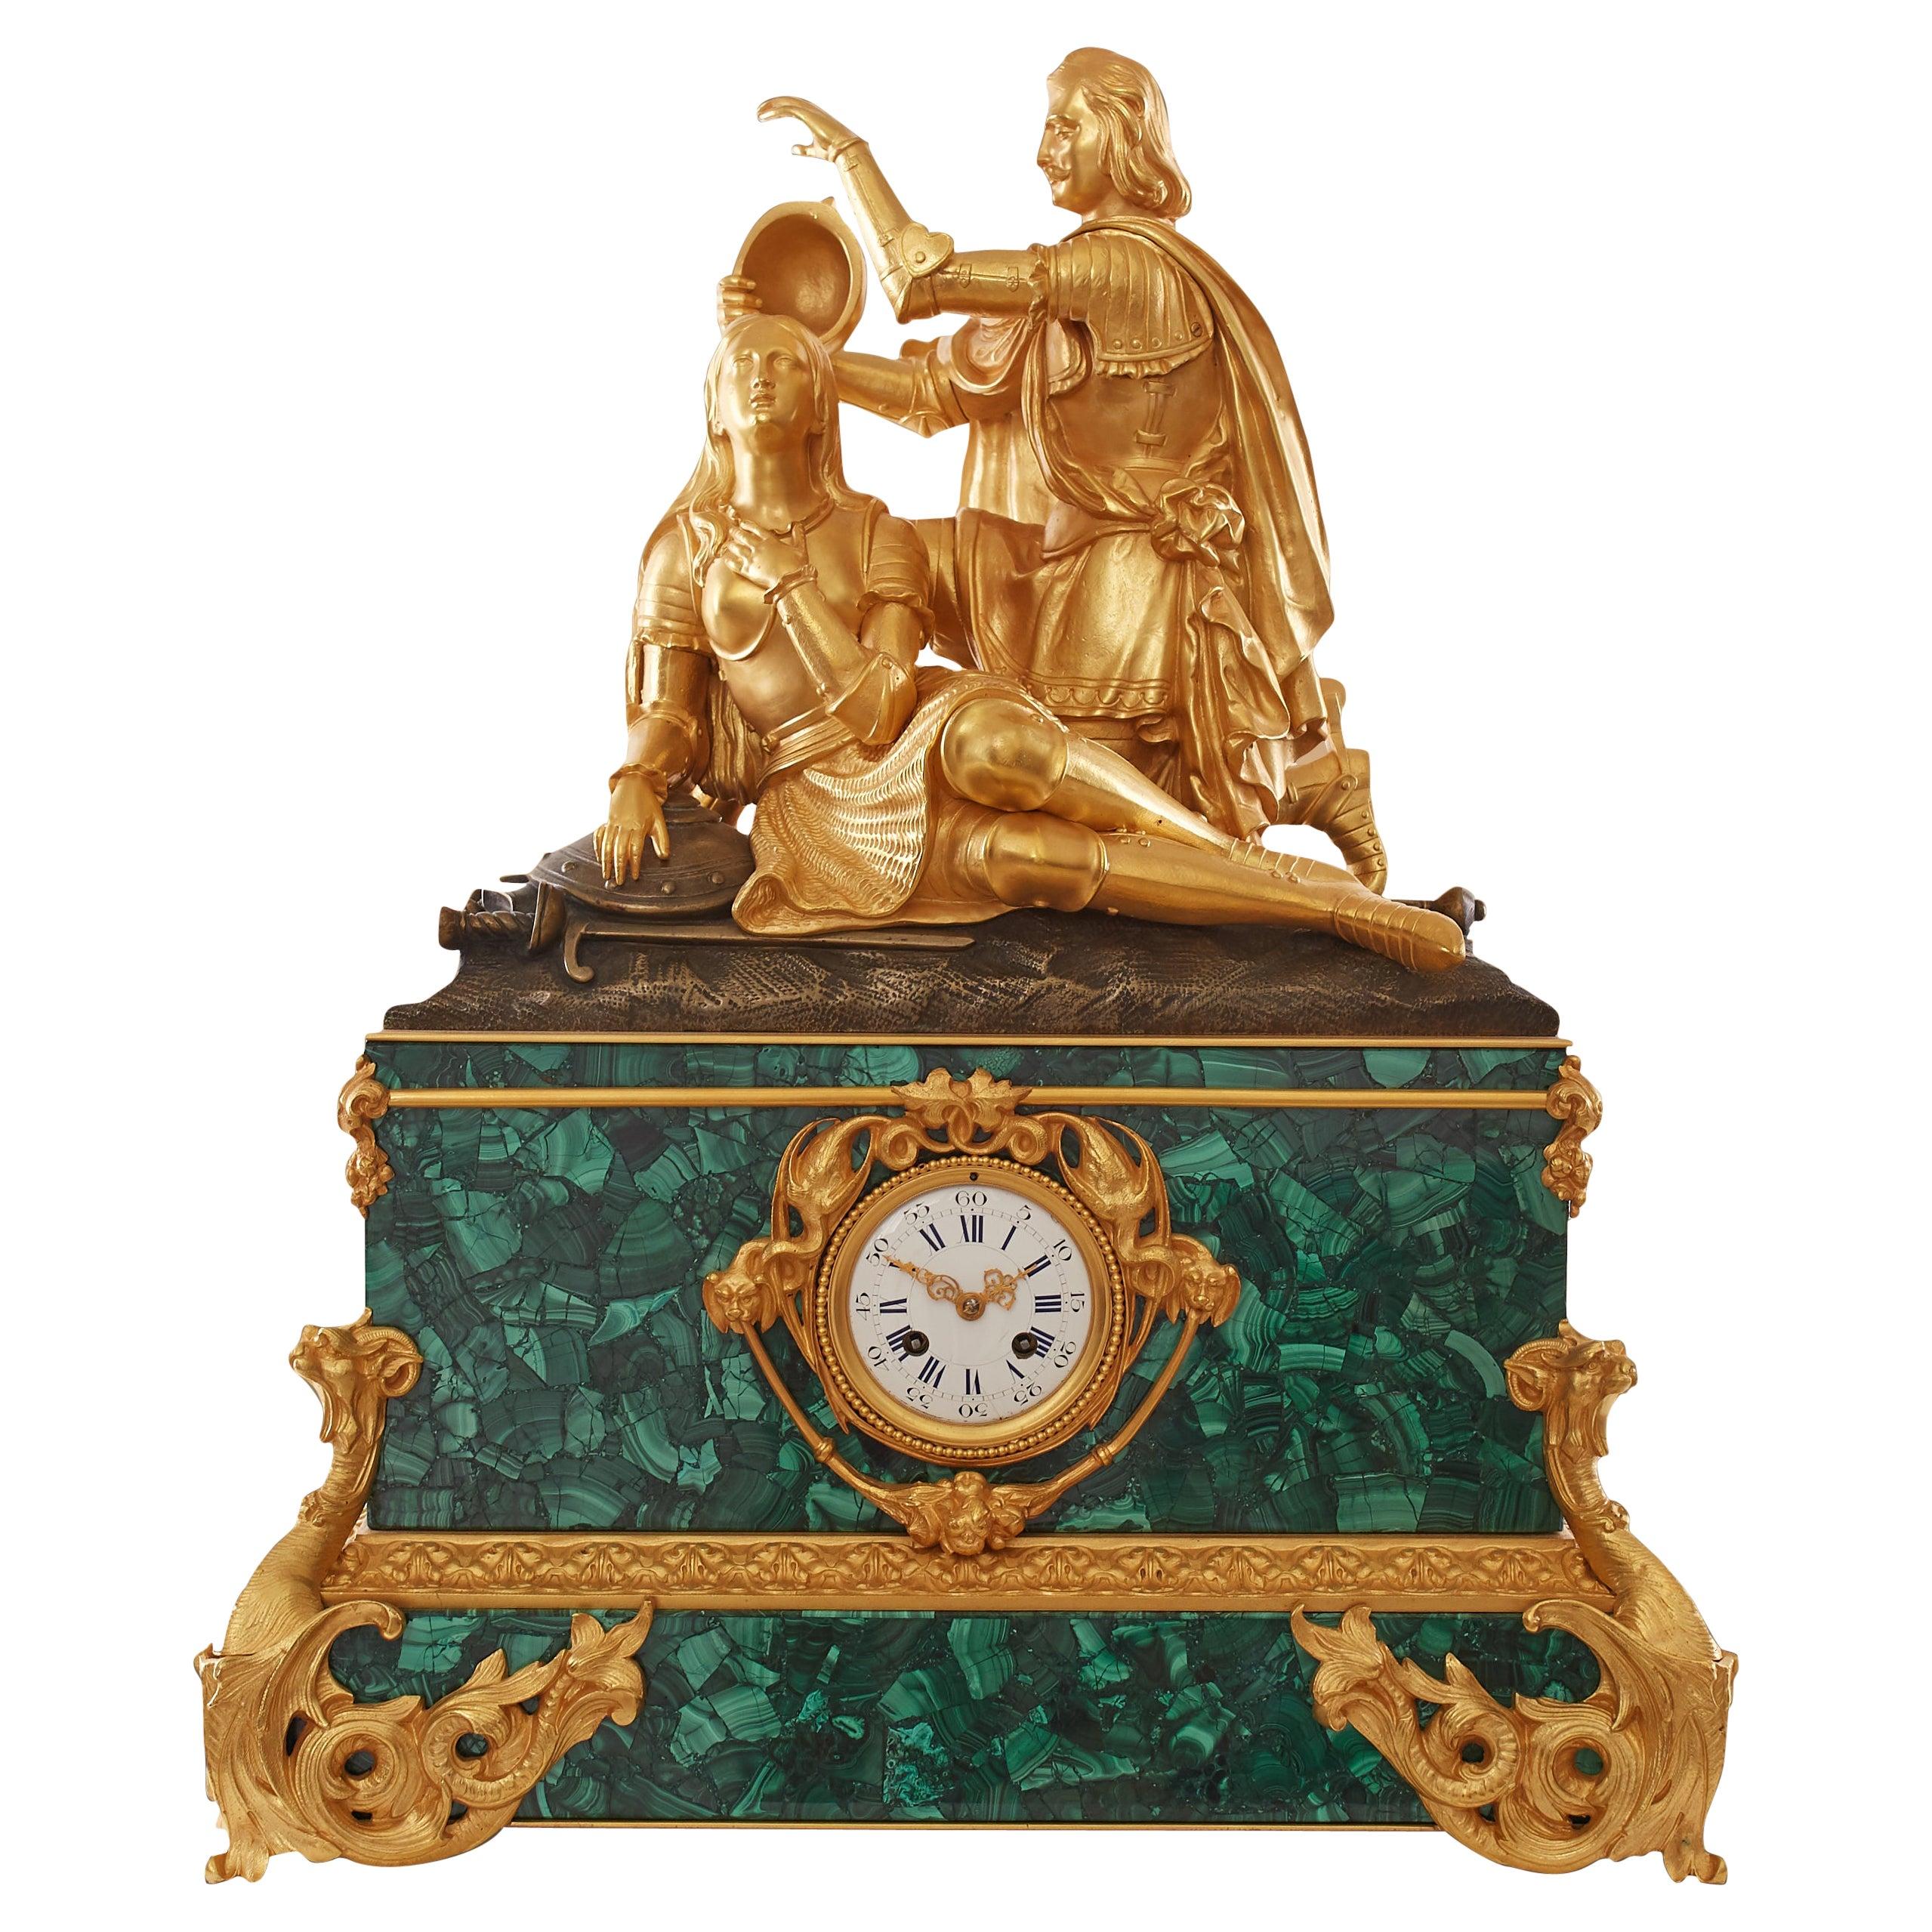 Charles X Period Ormolu and Malachite Mantel Clock